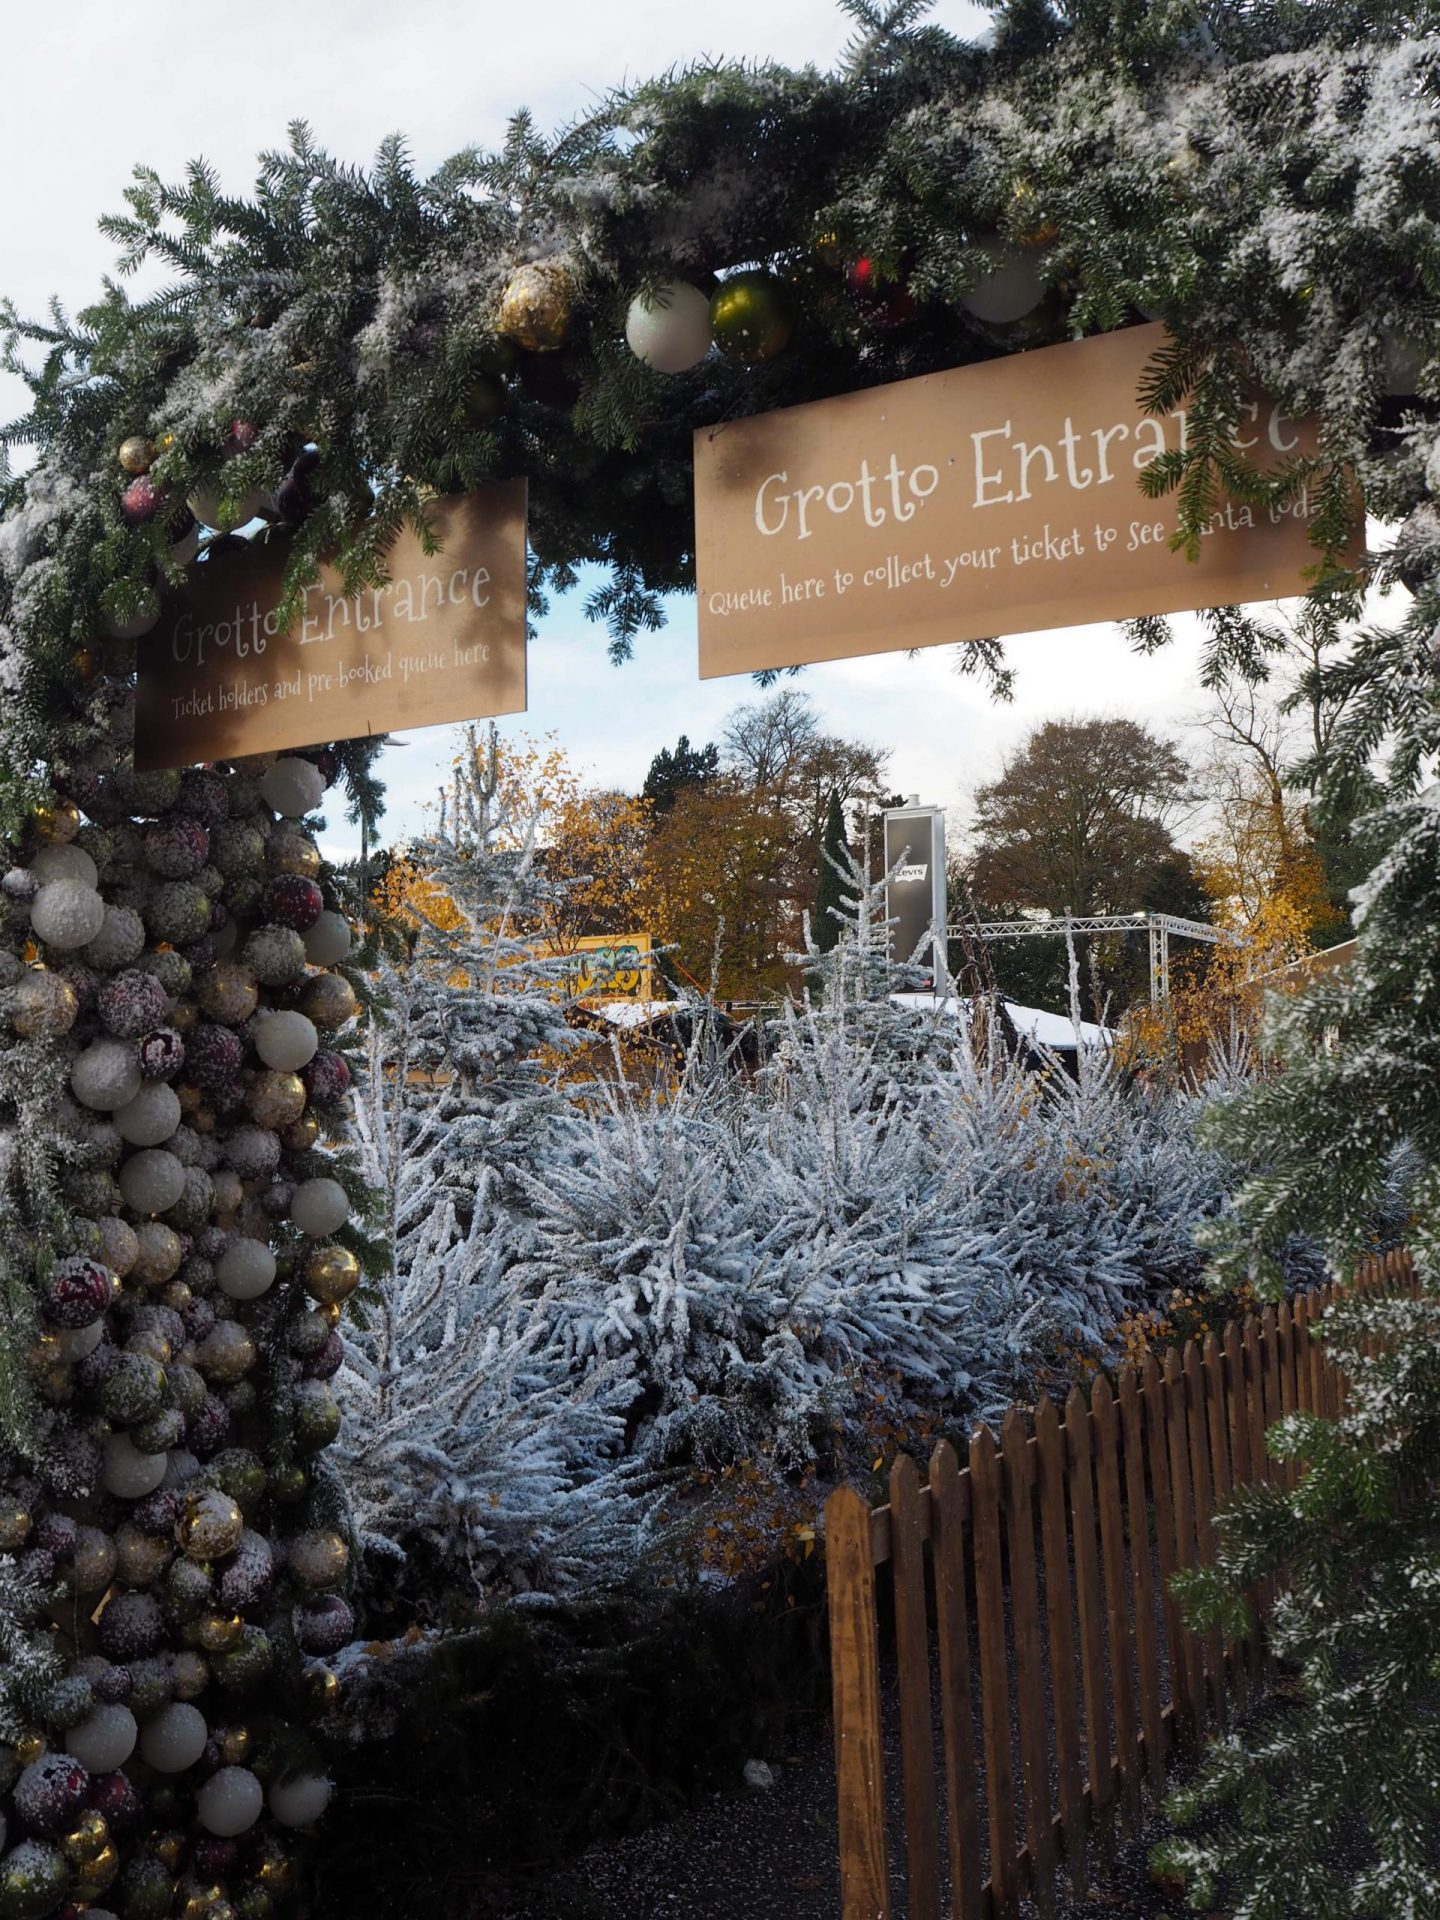 yorkshires-winter-wonderland-york-designer-outlet-rachel-nicole-uk-blogger-7